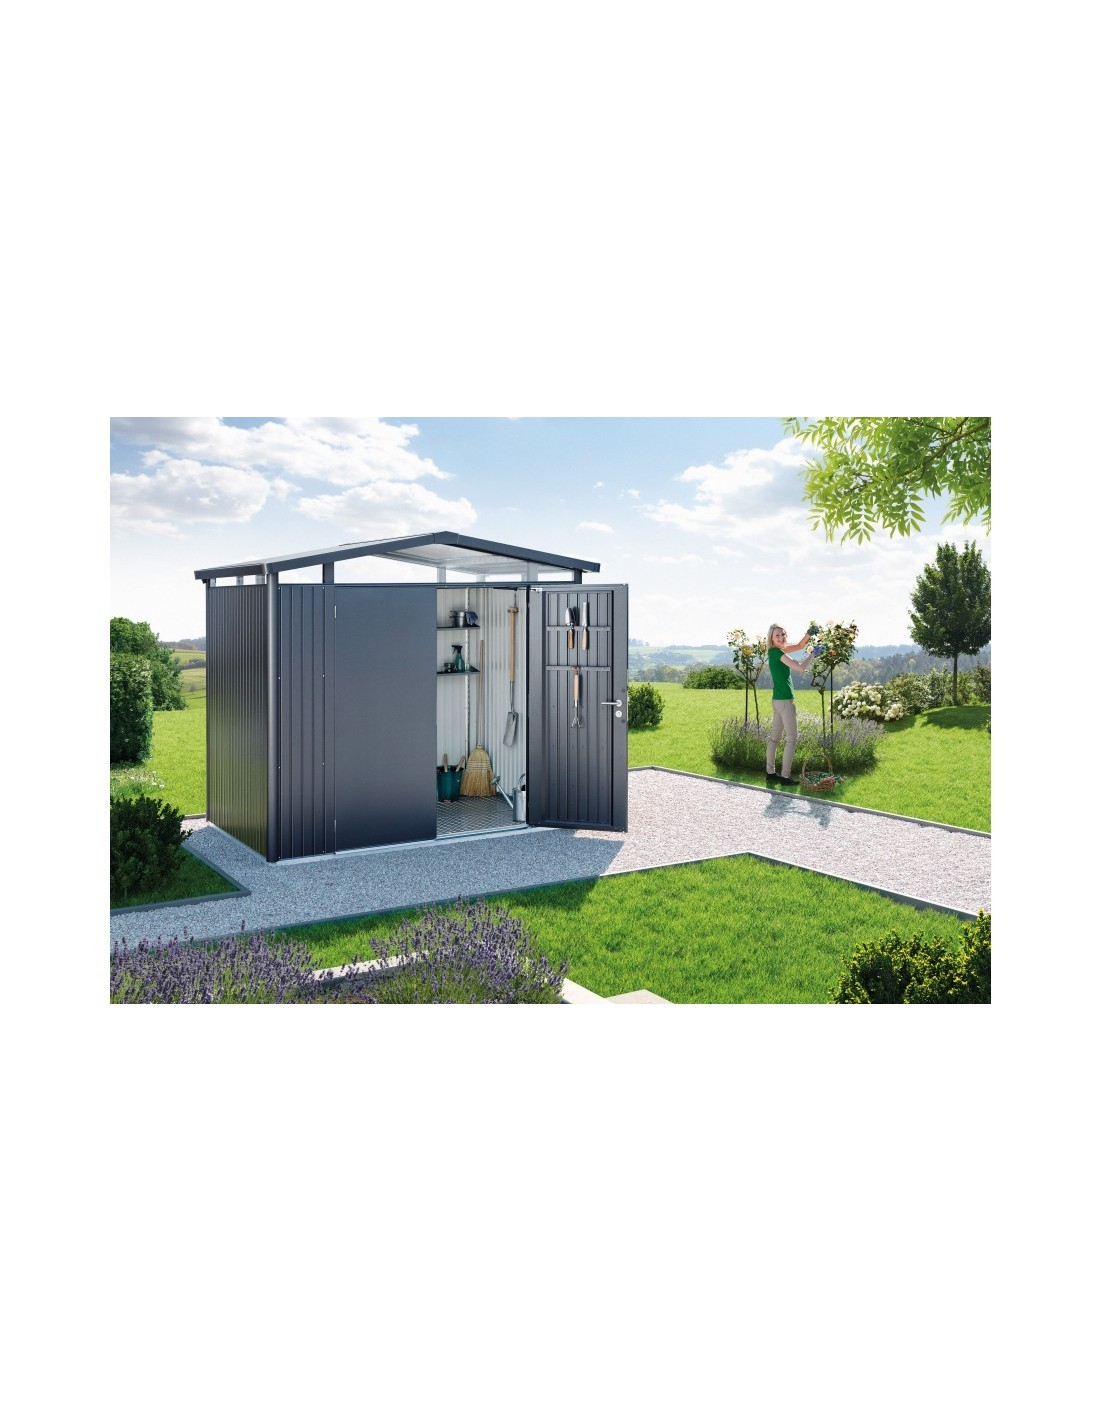 abri de jardin panorama double portes biohort de 8 7 m. Black Bedroom Furniture Sets. Home Design Ideas